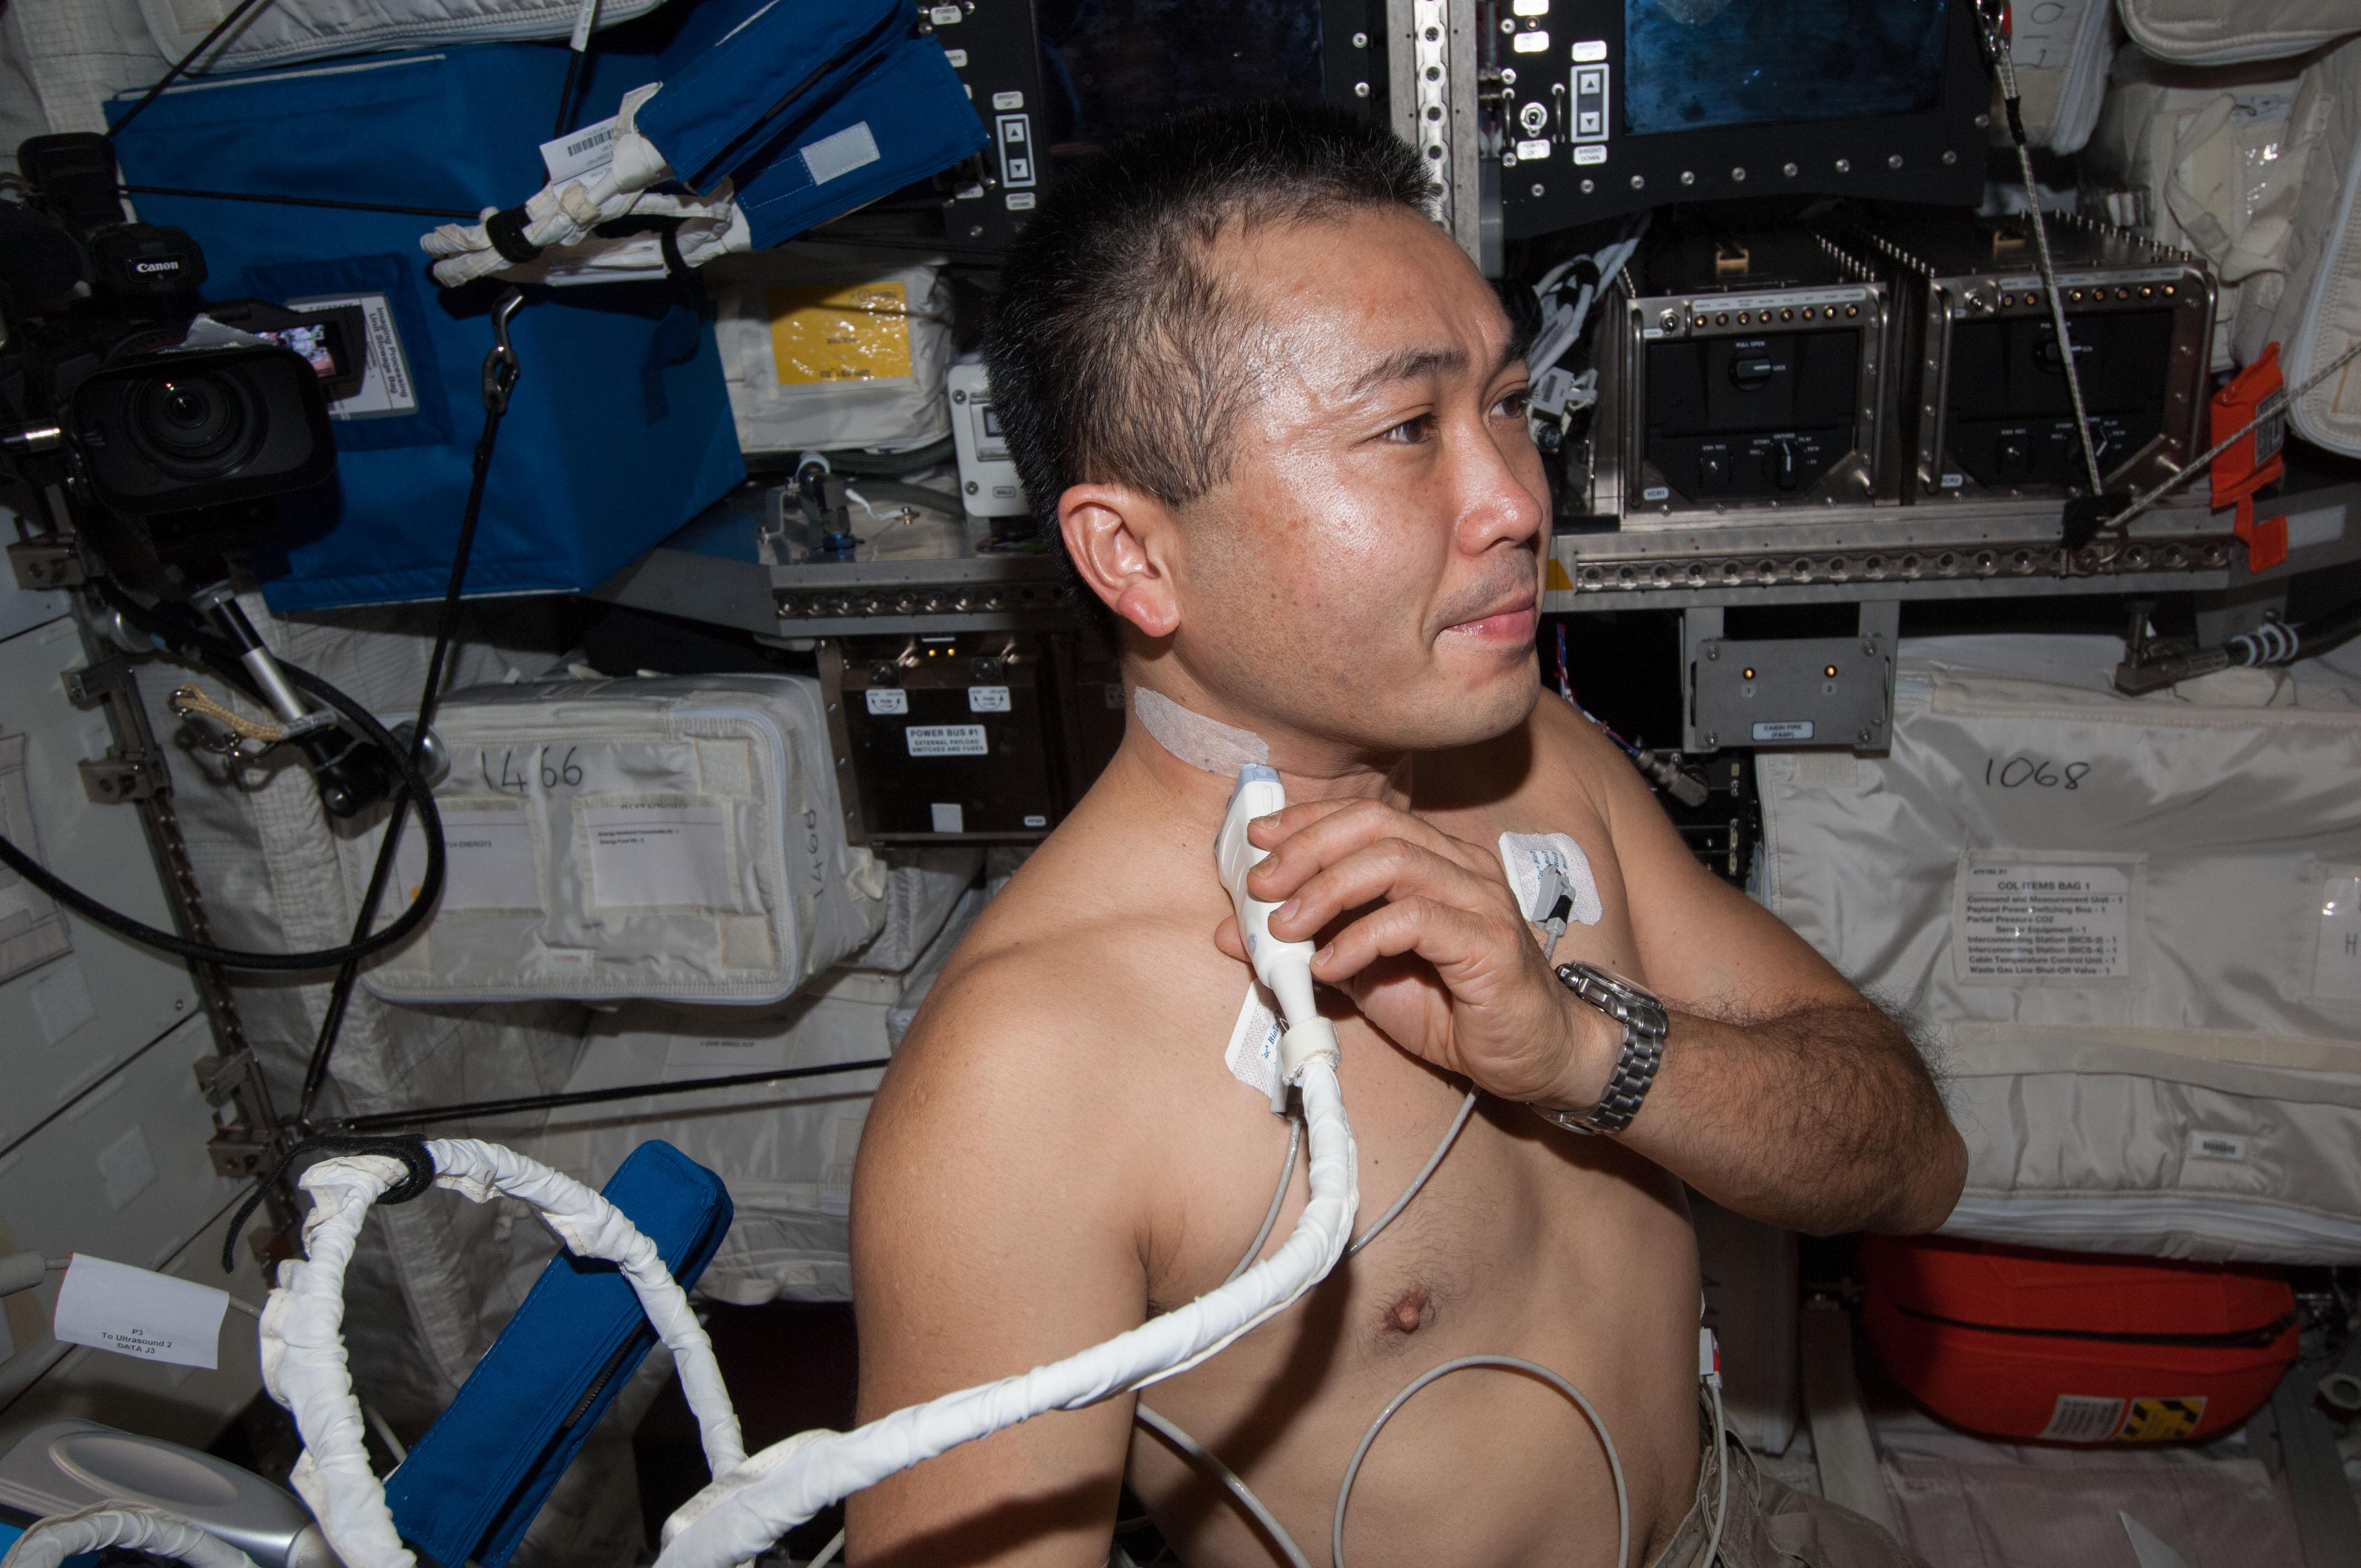 hazards of being an astronaut - photo #30